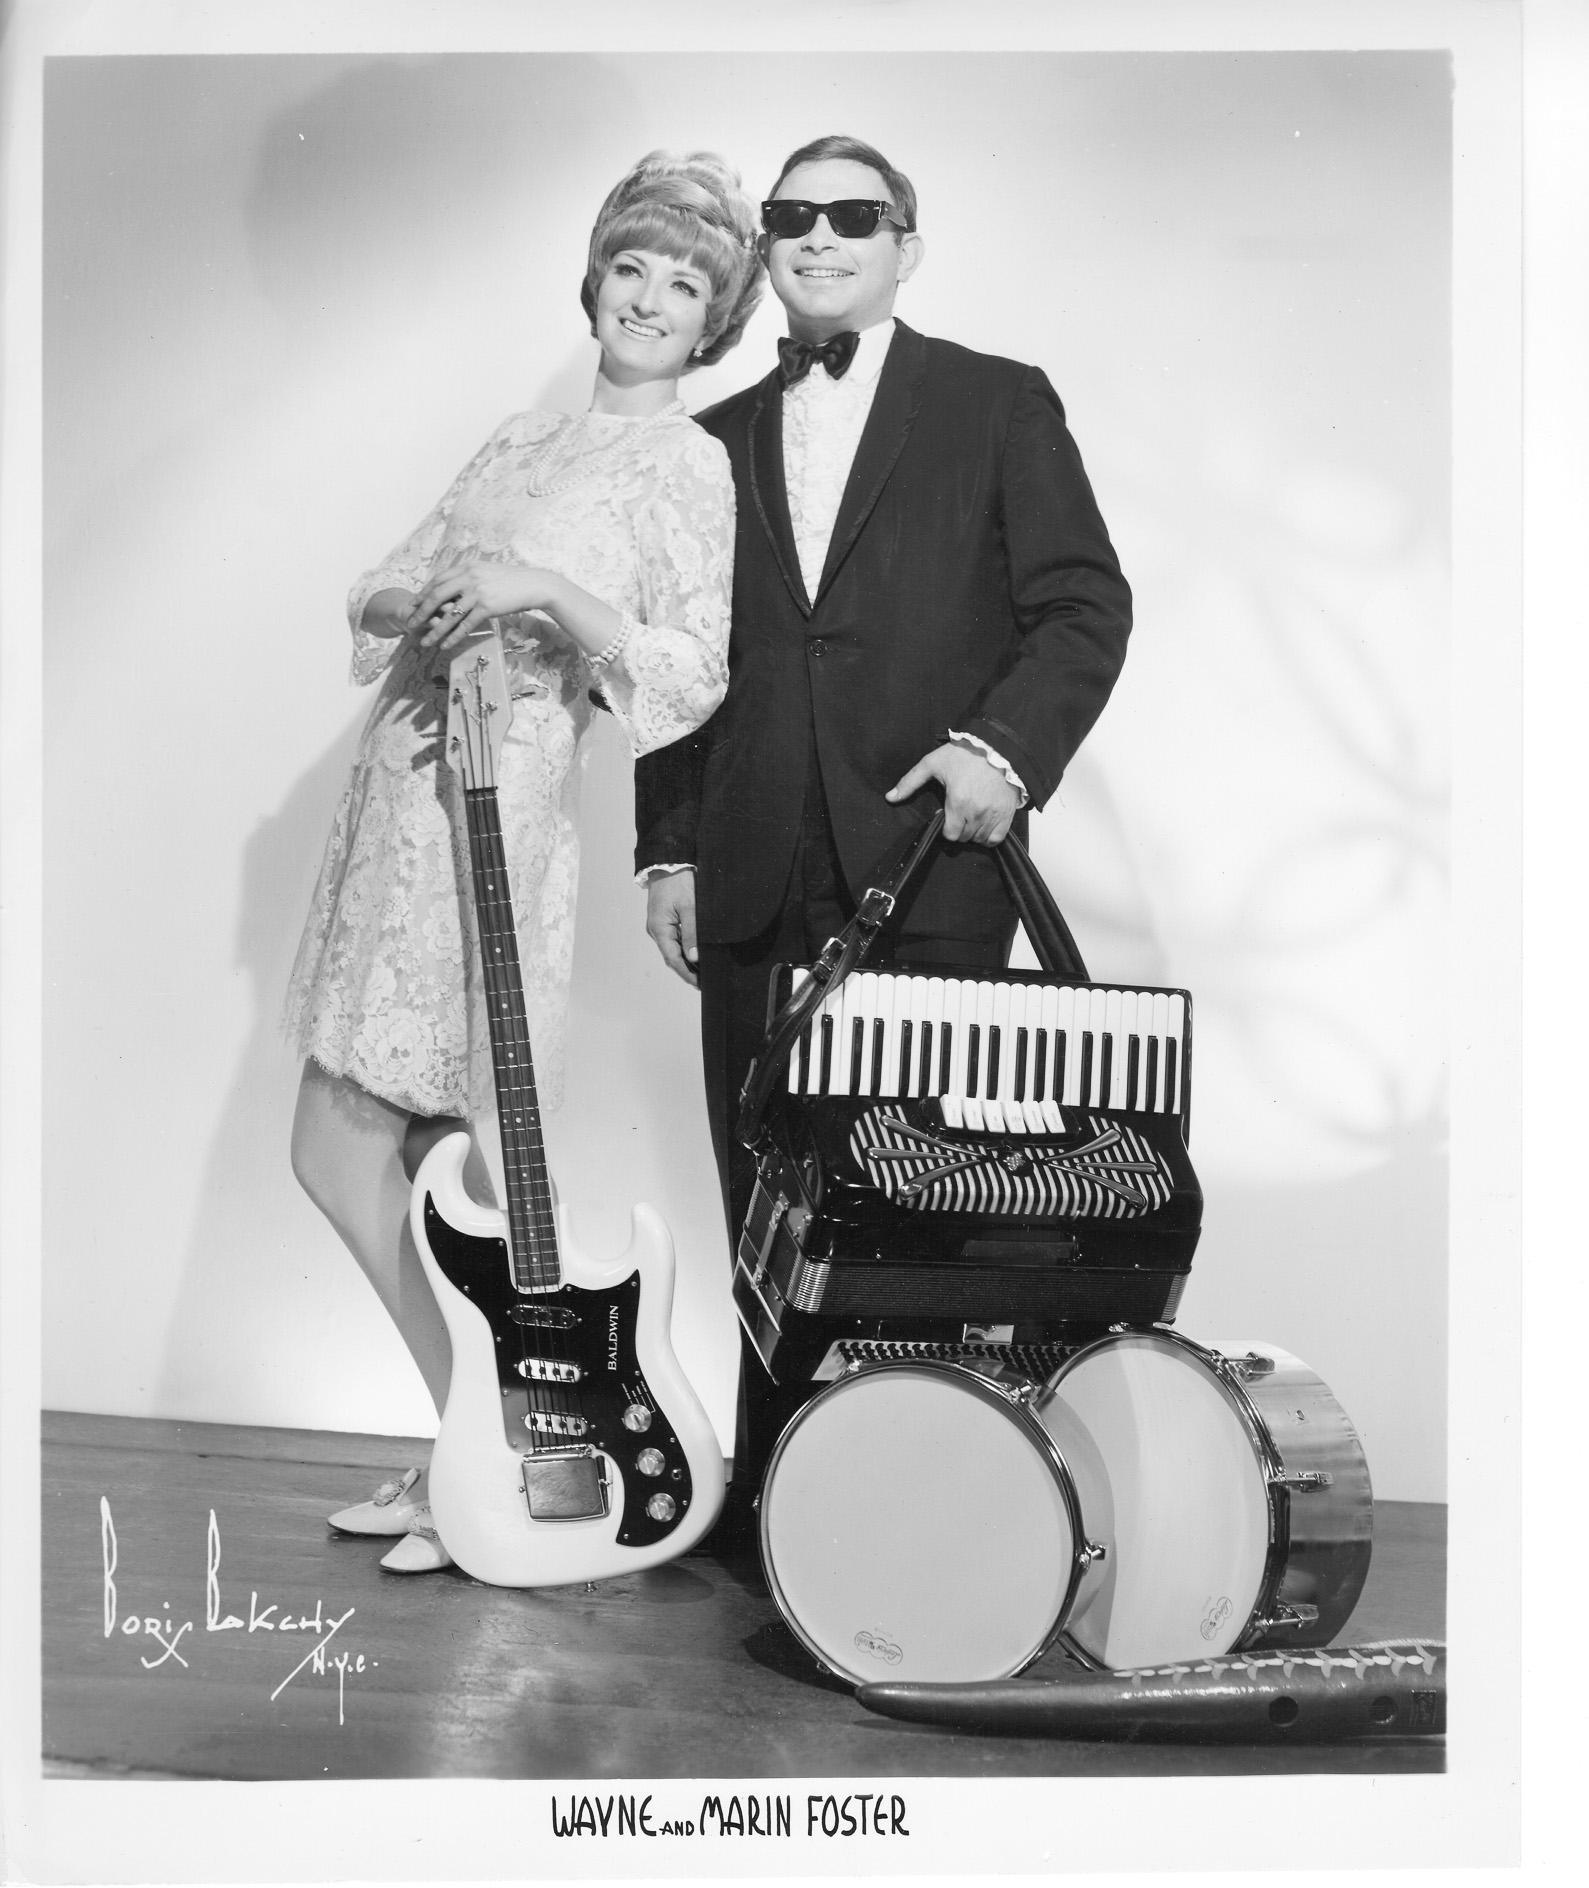 Wayne and Marin Foster